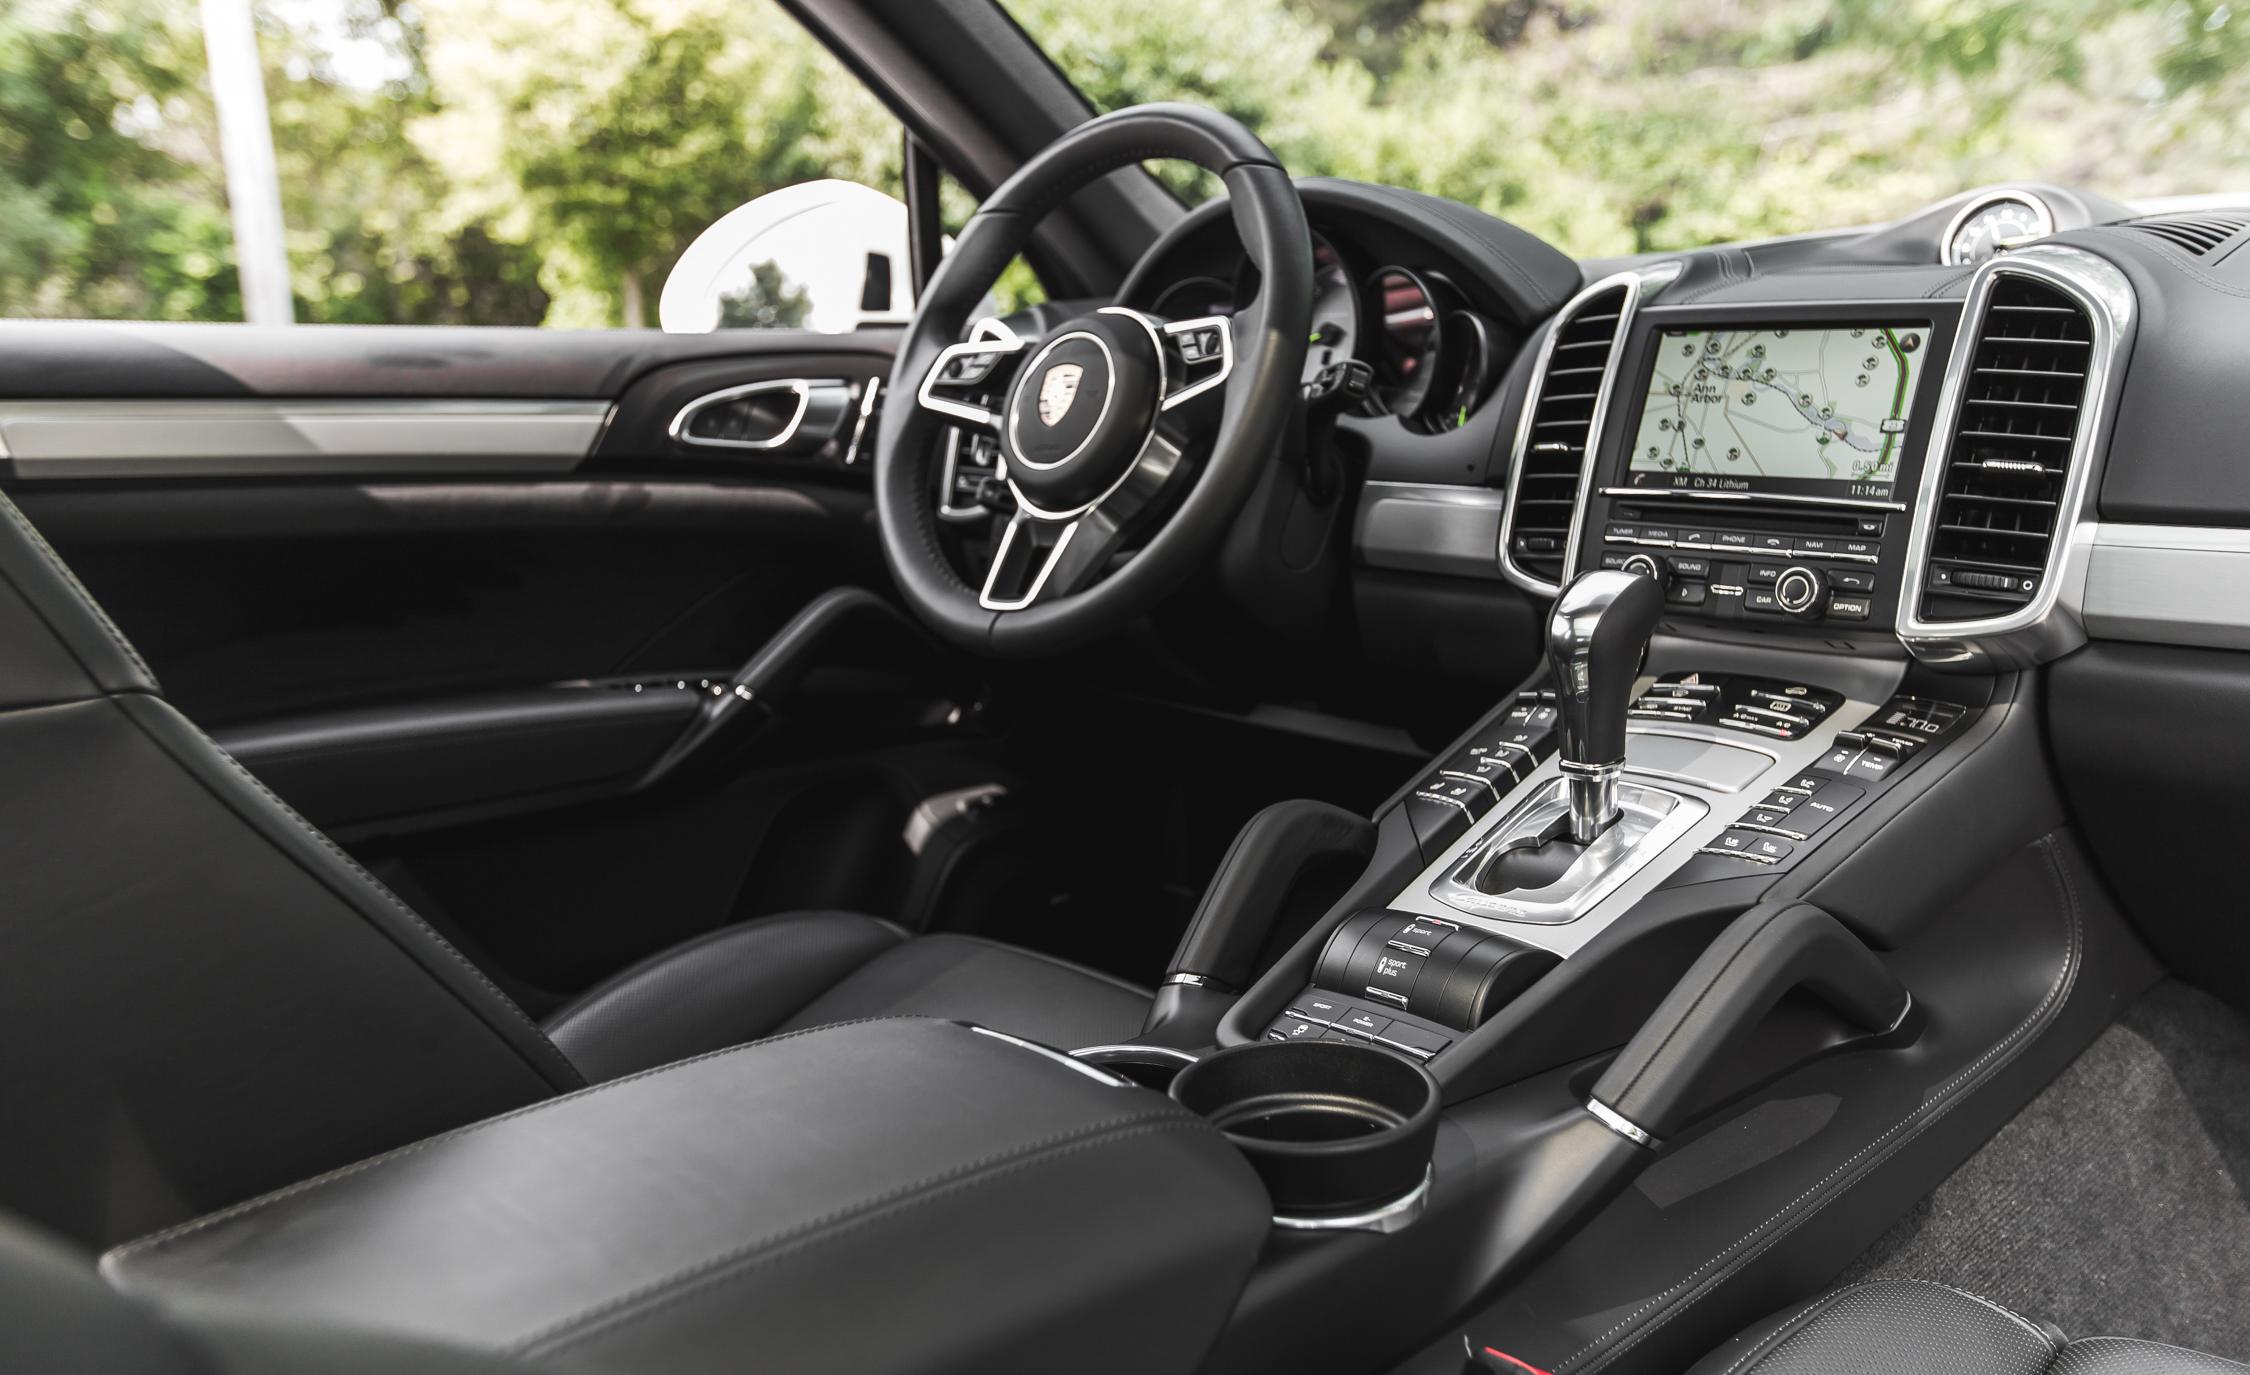 2015 Porsche Cayenne S E-Hybrid Interior Cockpit